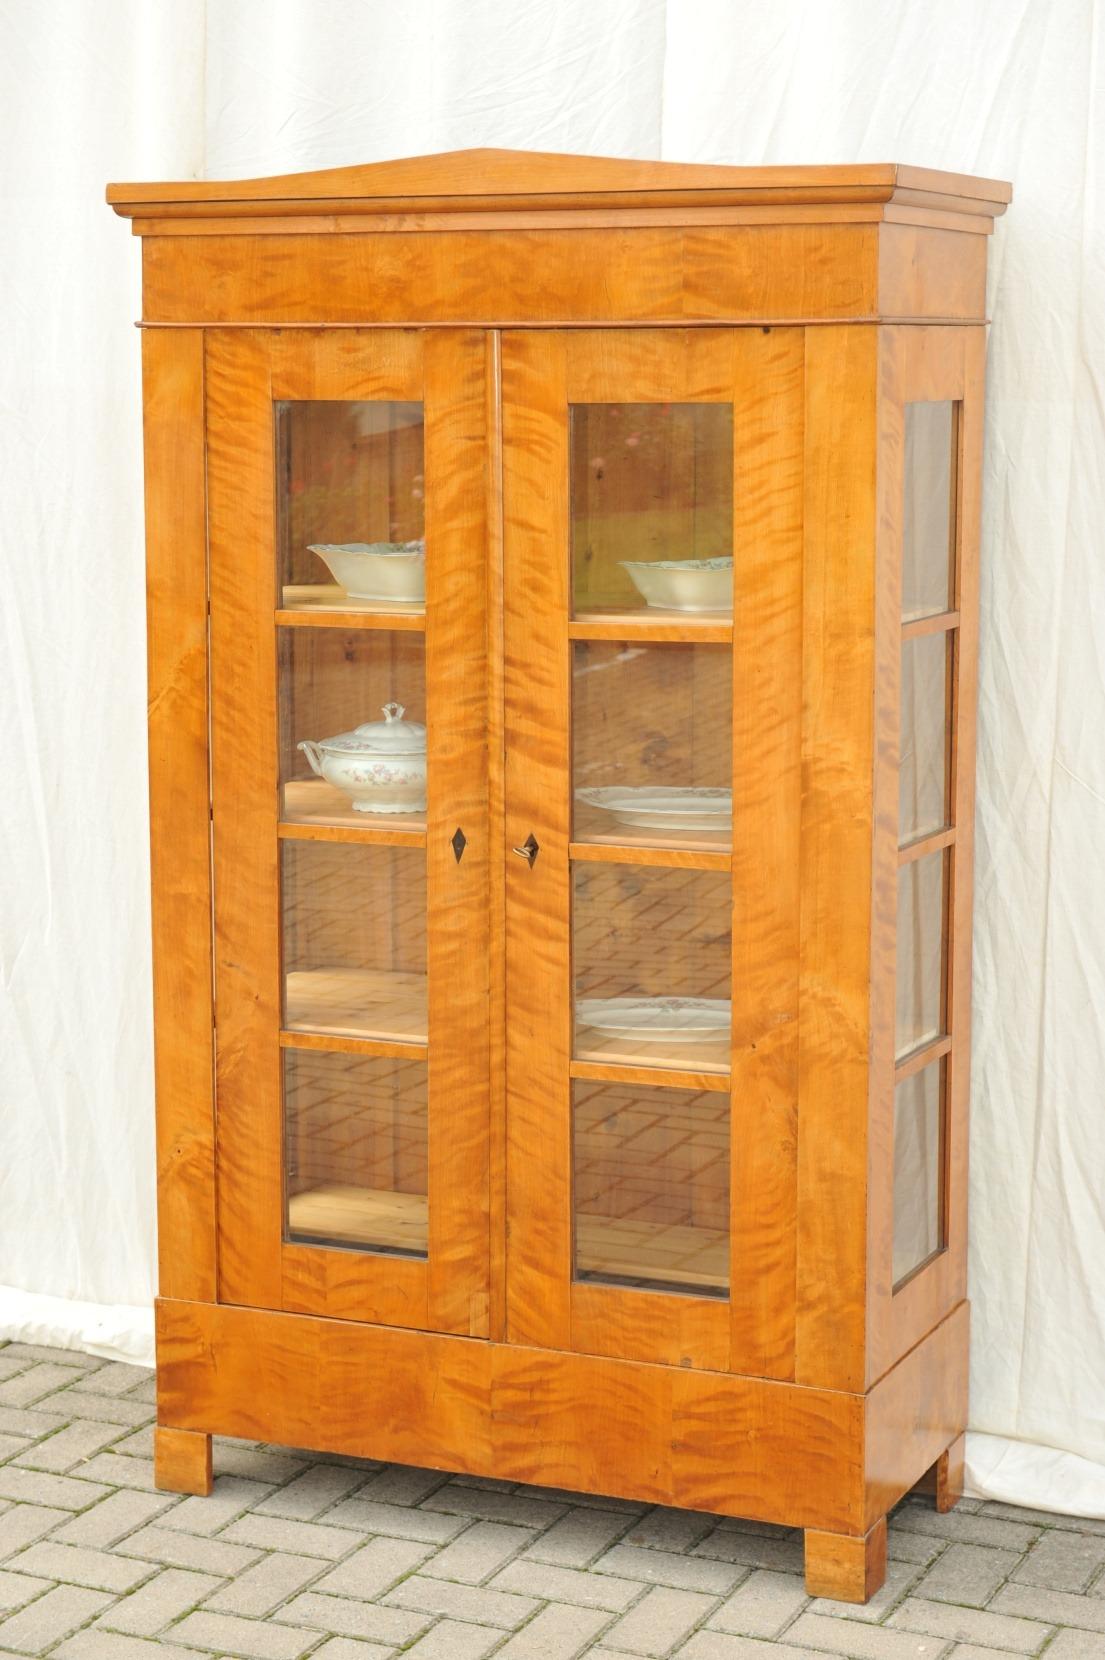 biedermeier vitrinenschrank birke antik im hof biedermeier vitrine seitenverglast birke. Black Bedroom Furniture Sets. Home Design Ideas